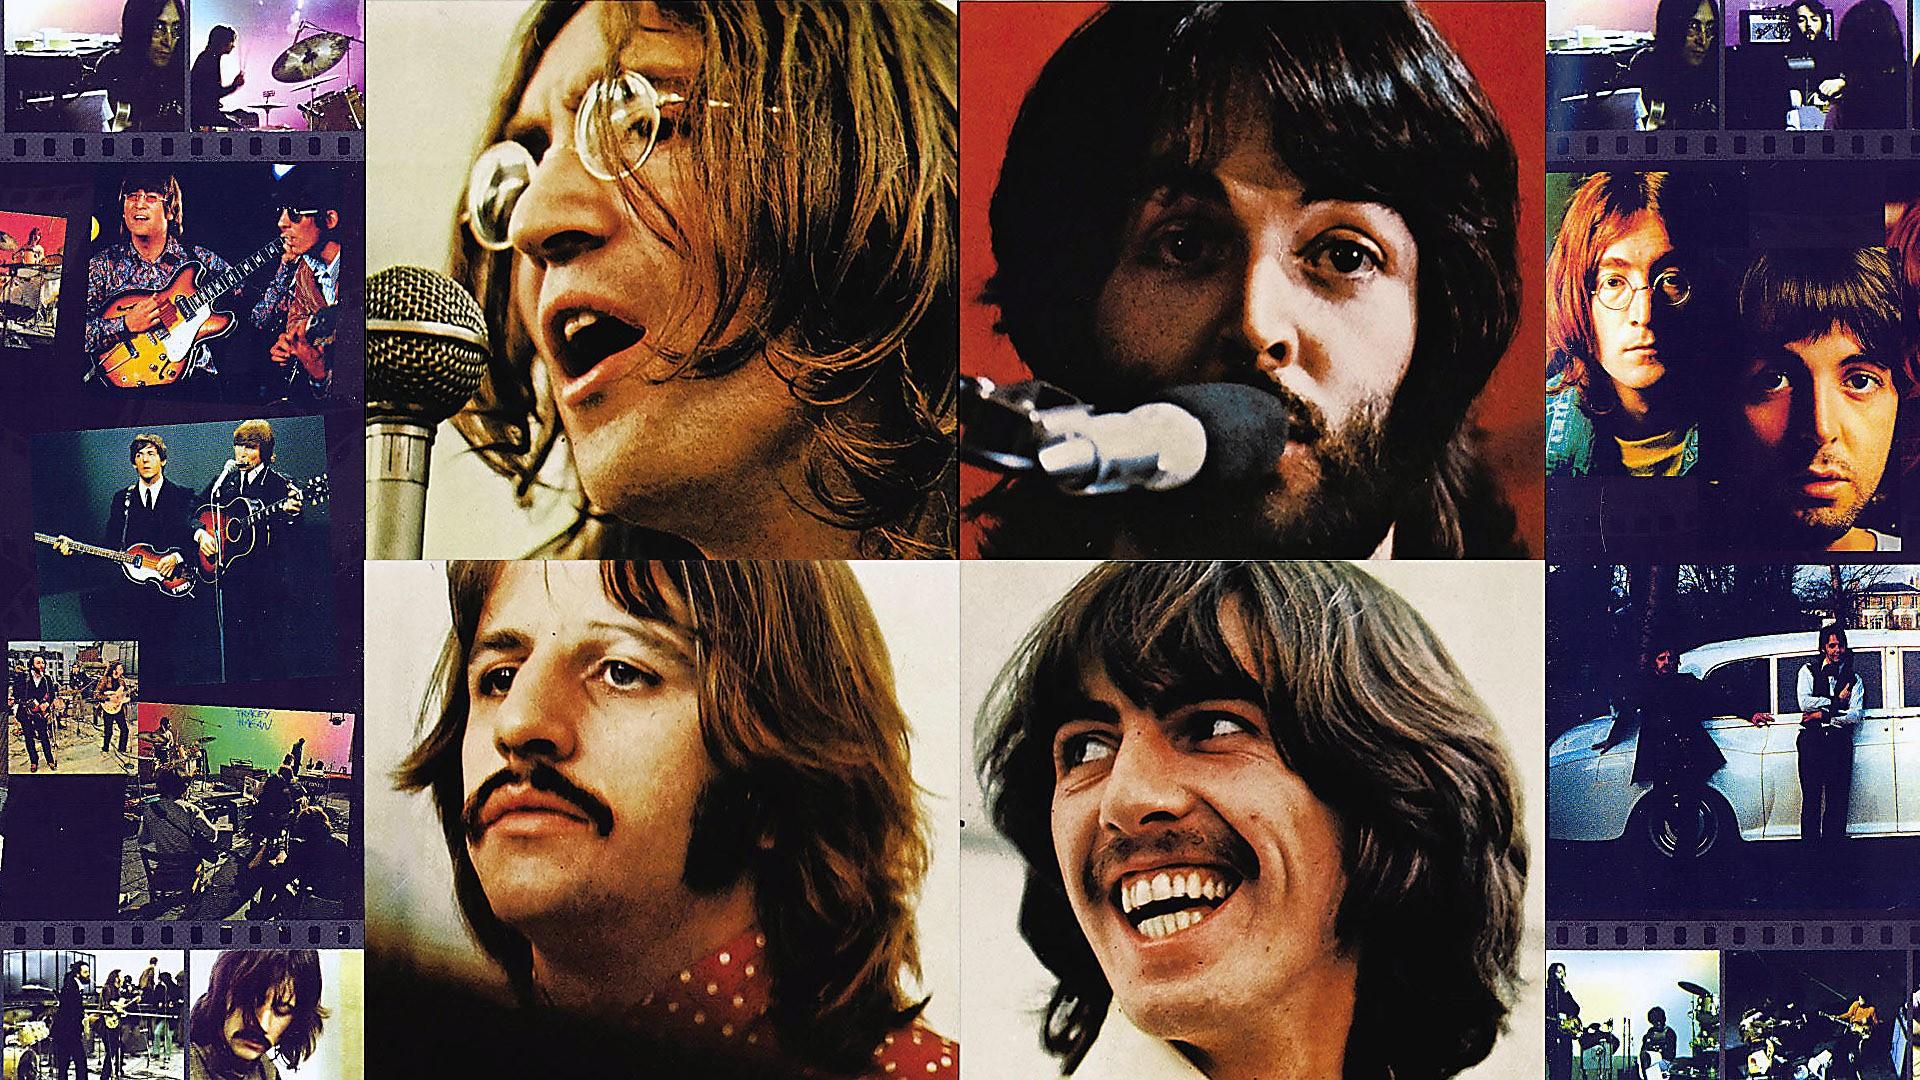 Music The Beatles Wallpaper 1920x1080